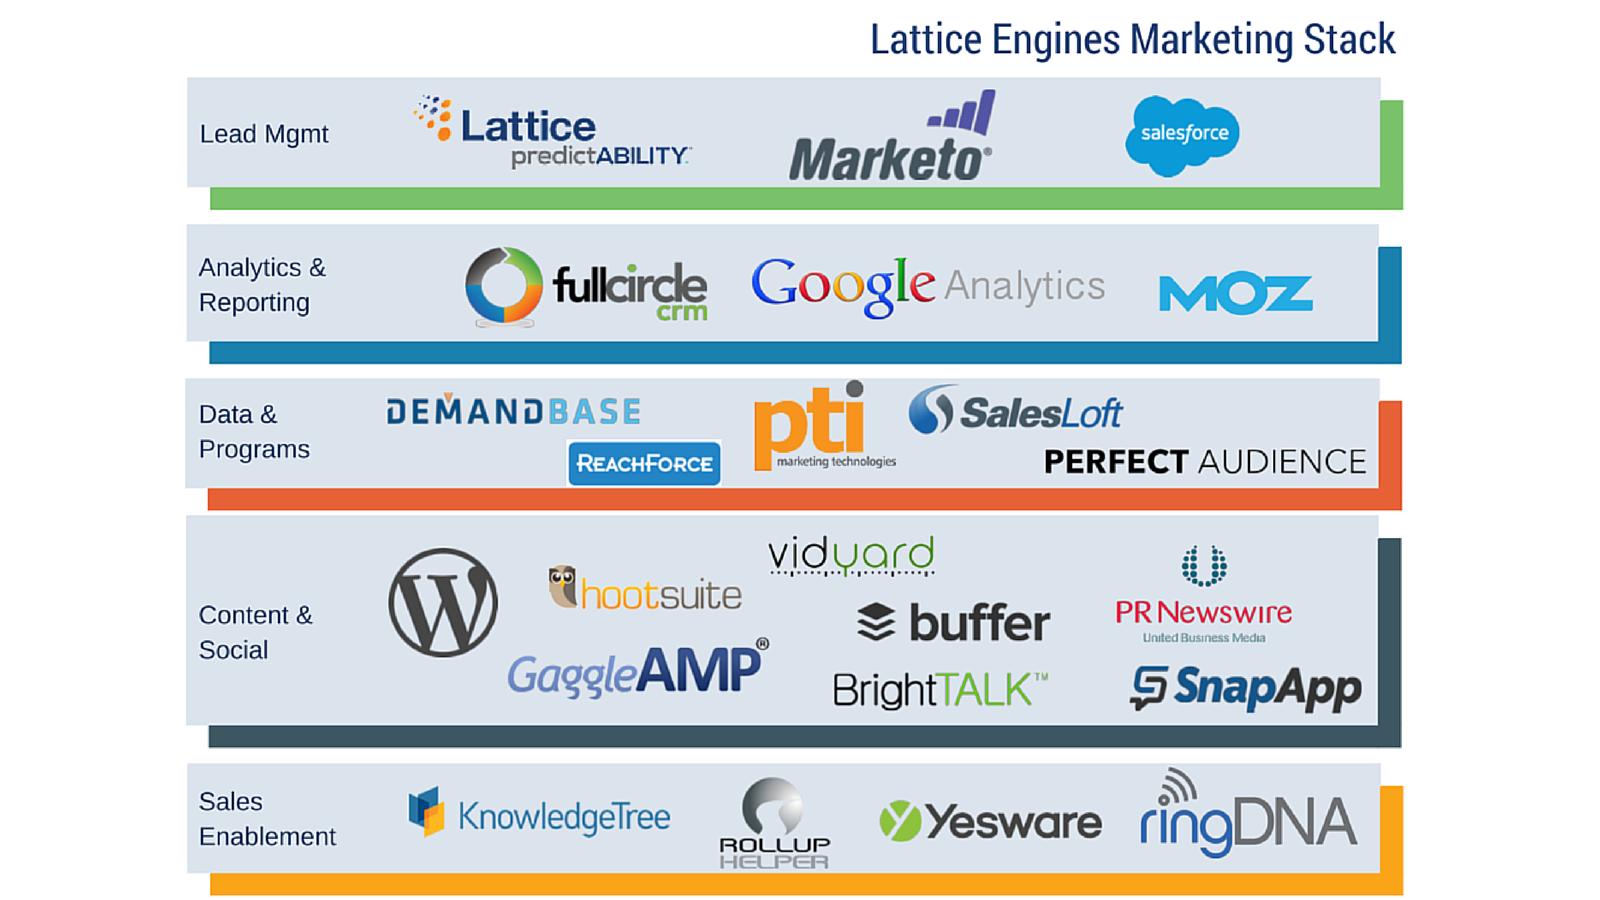 tecnología de marketing para freelance